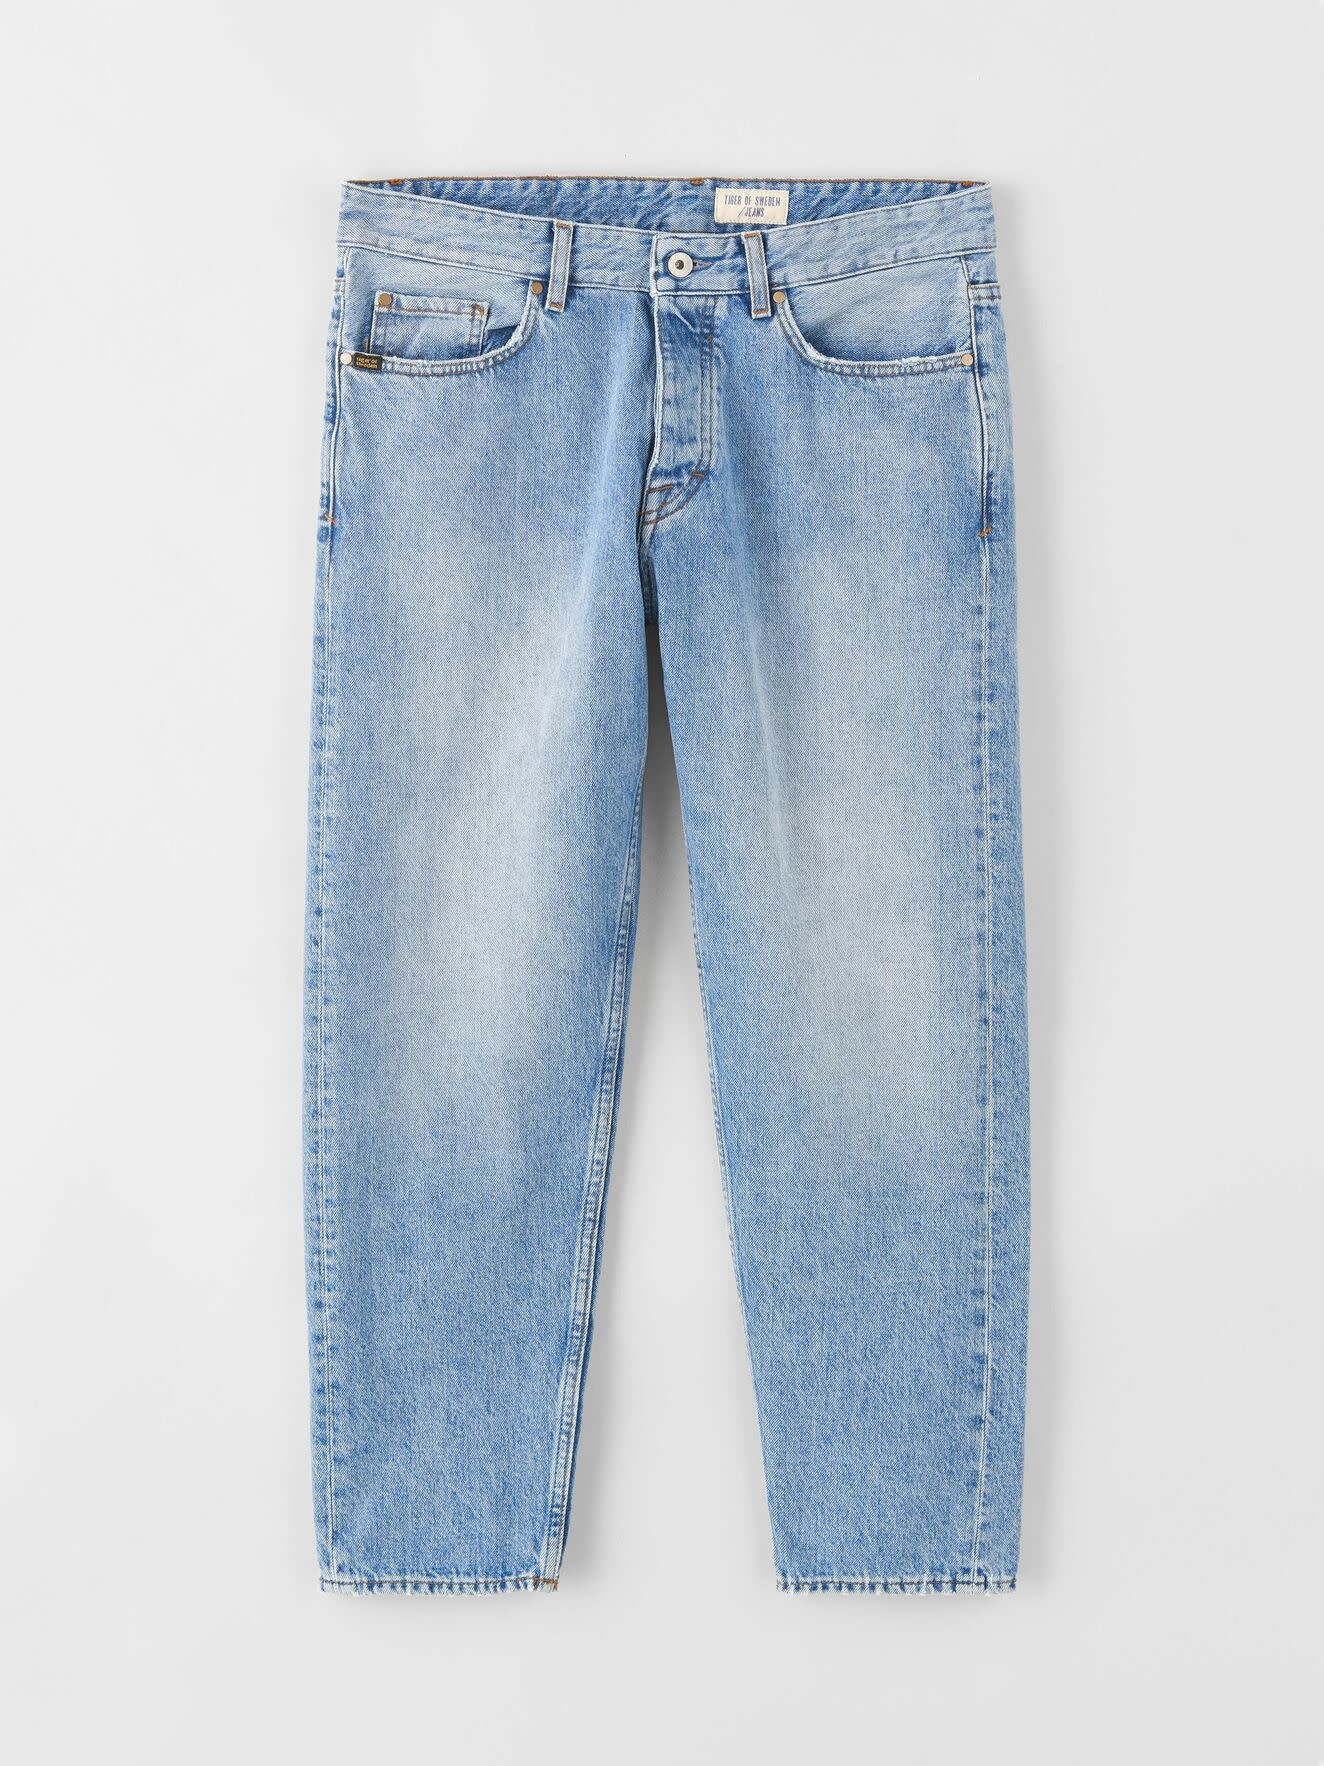 Jud light Blue Jeans Boxer Fit-1